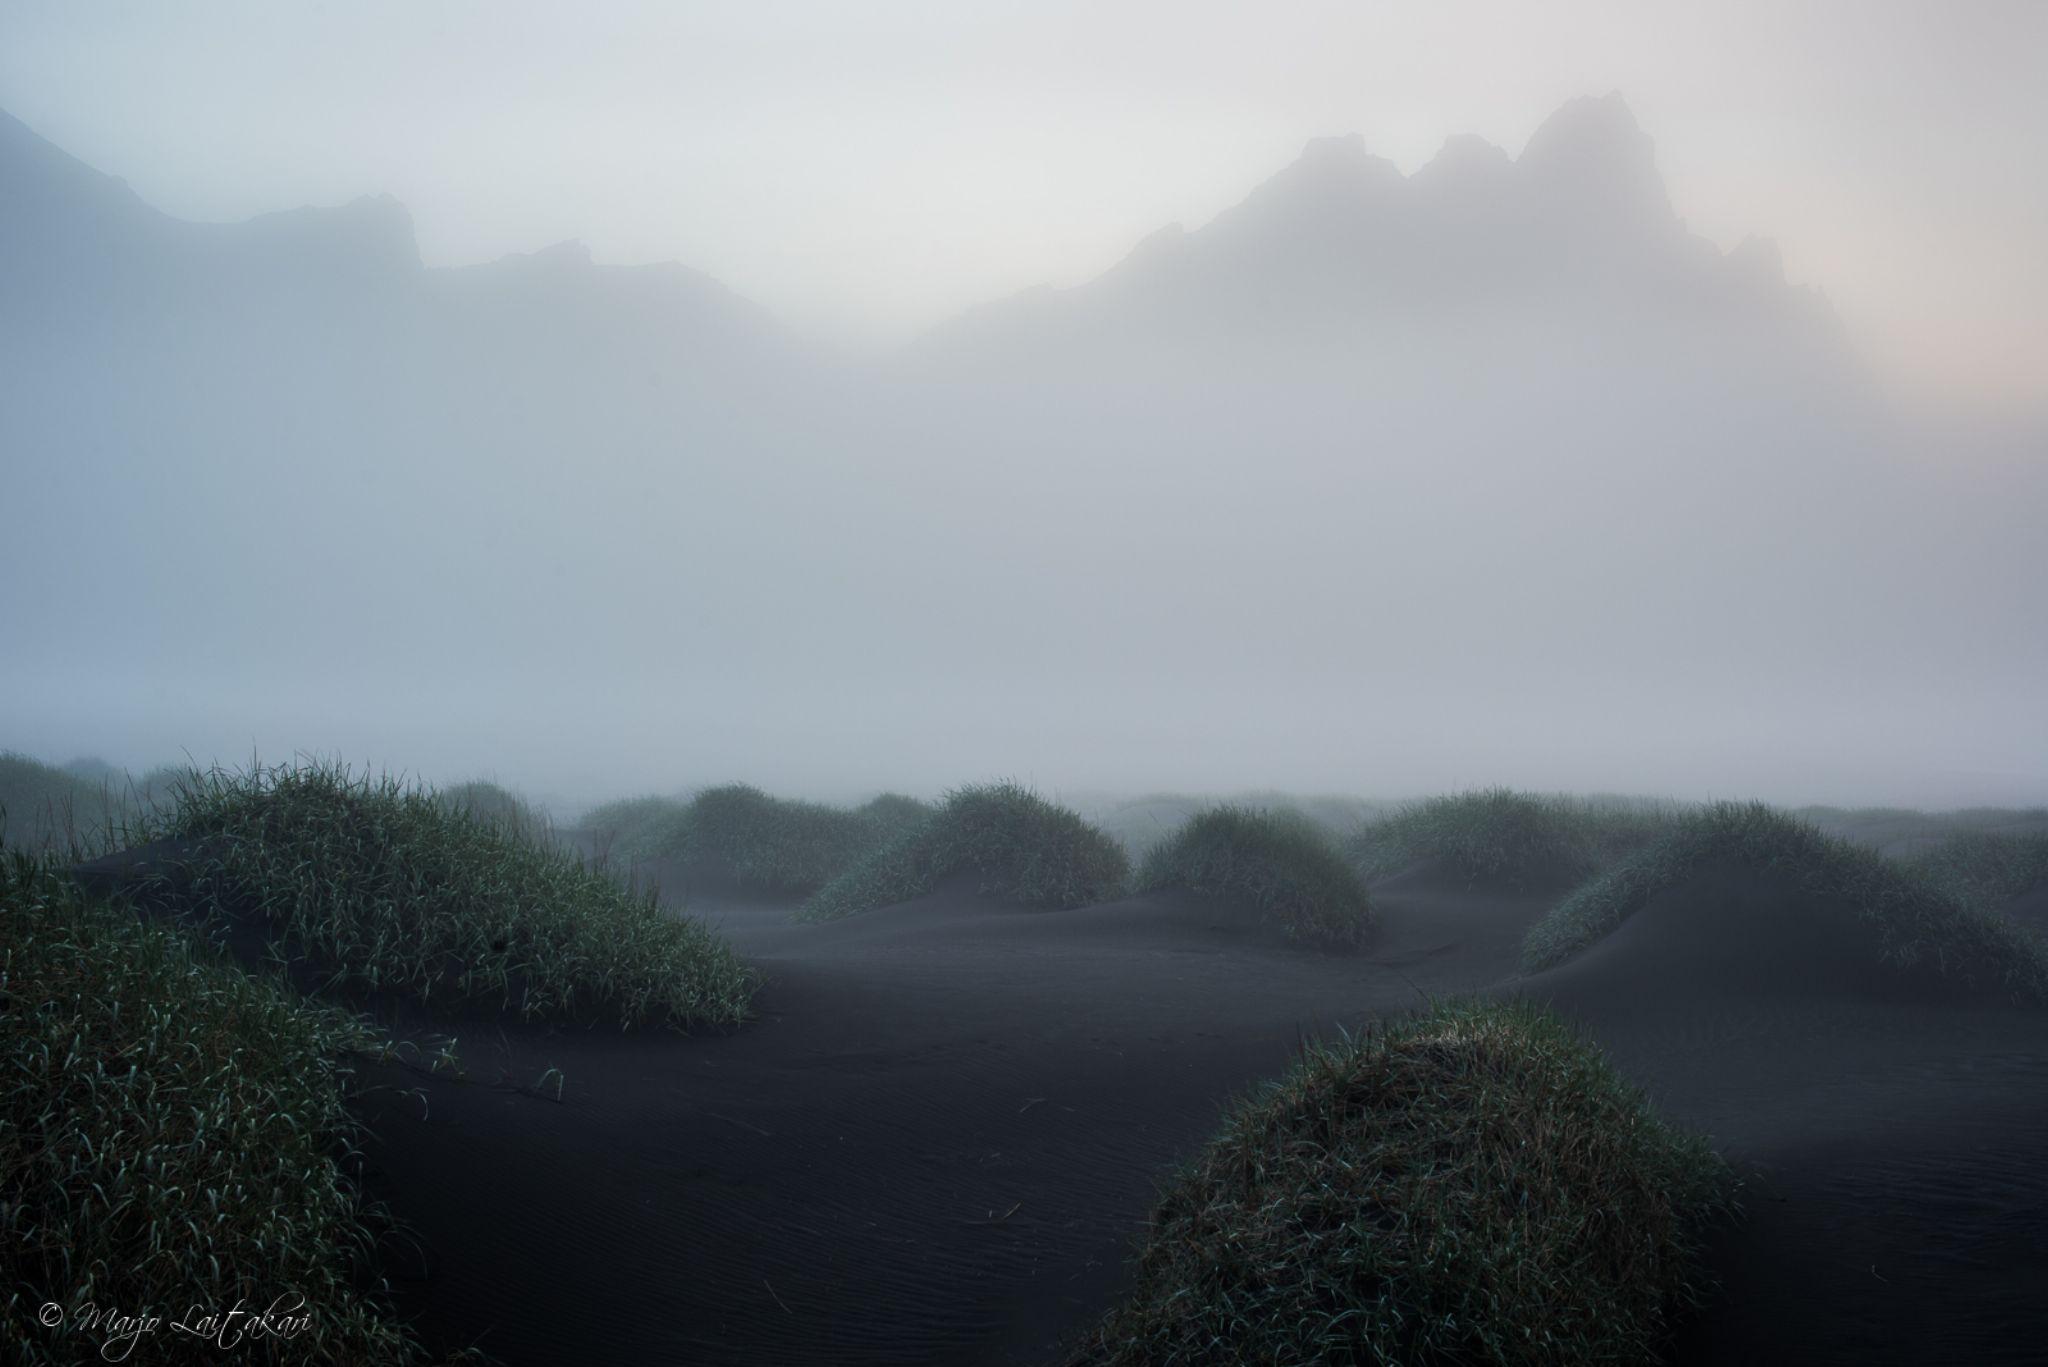 Stokksnes, Iceland by Marjo Laitakari